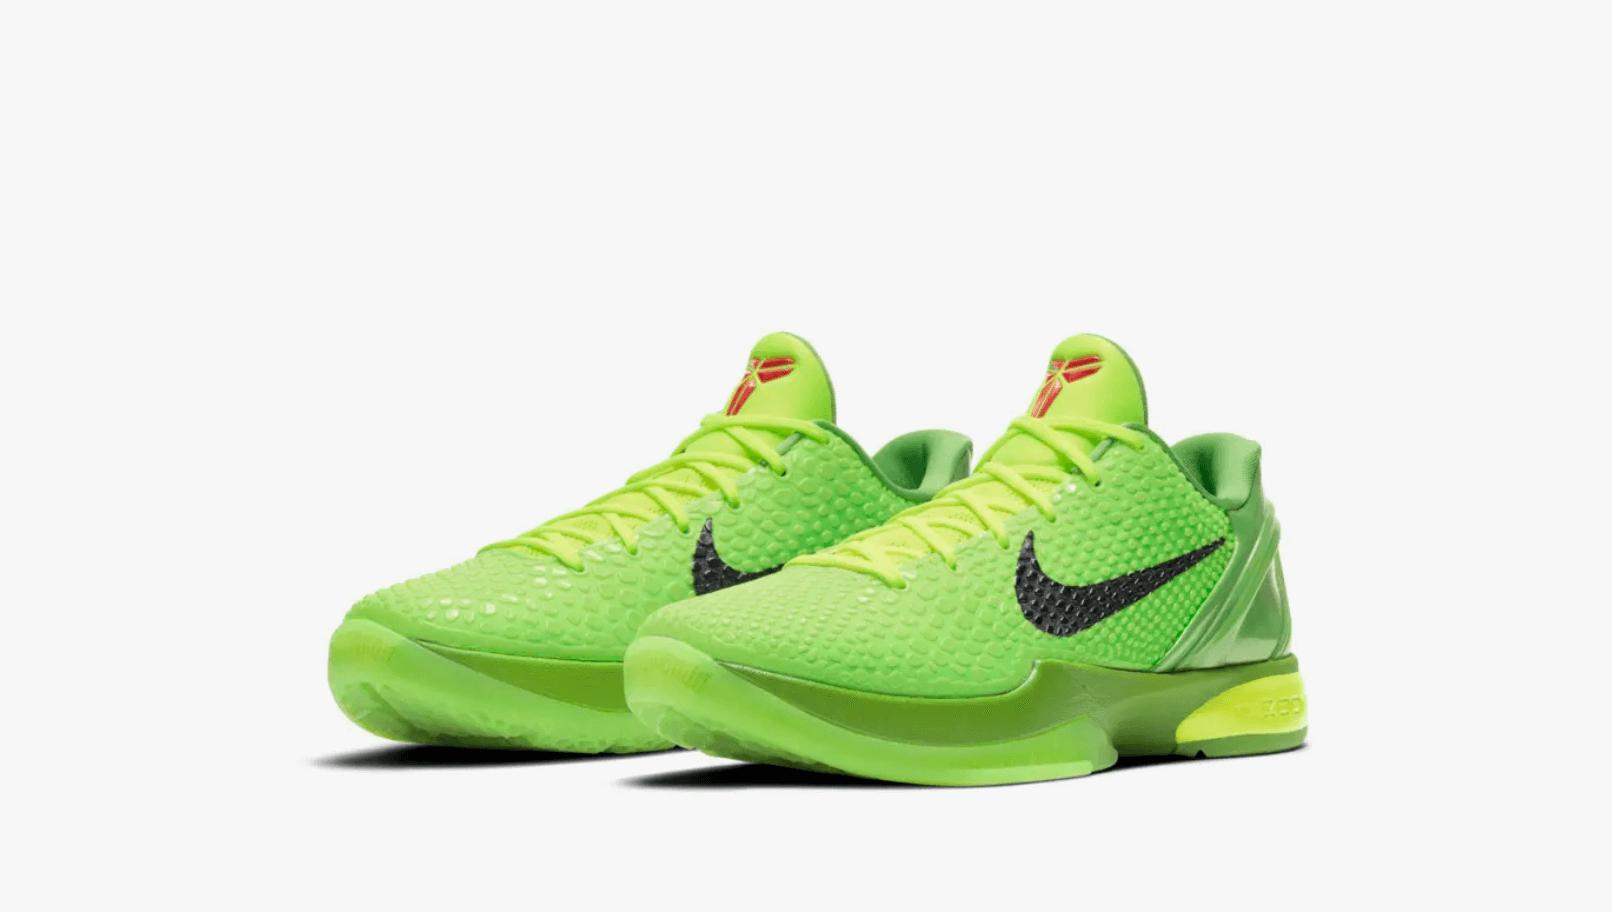 Envío Fanático tonto  🥇 NIKE Kobe 6 Proto Green Apple 2020 ++ TOP TOP++ | zapatillasysneakers.com